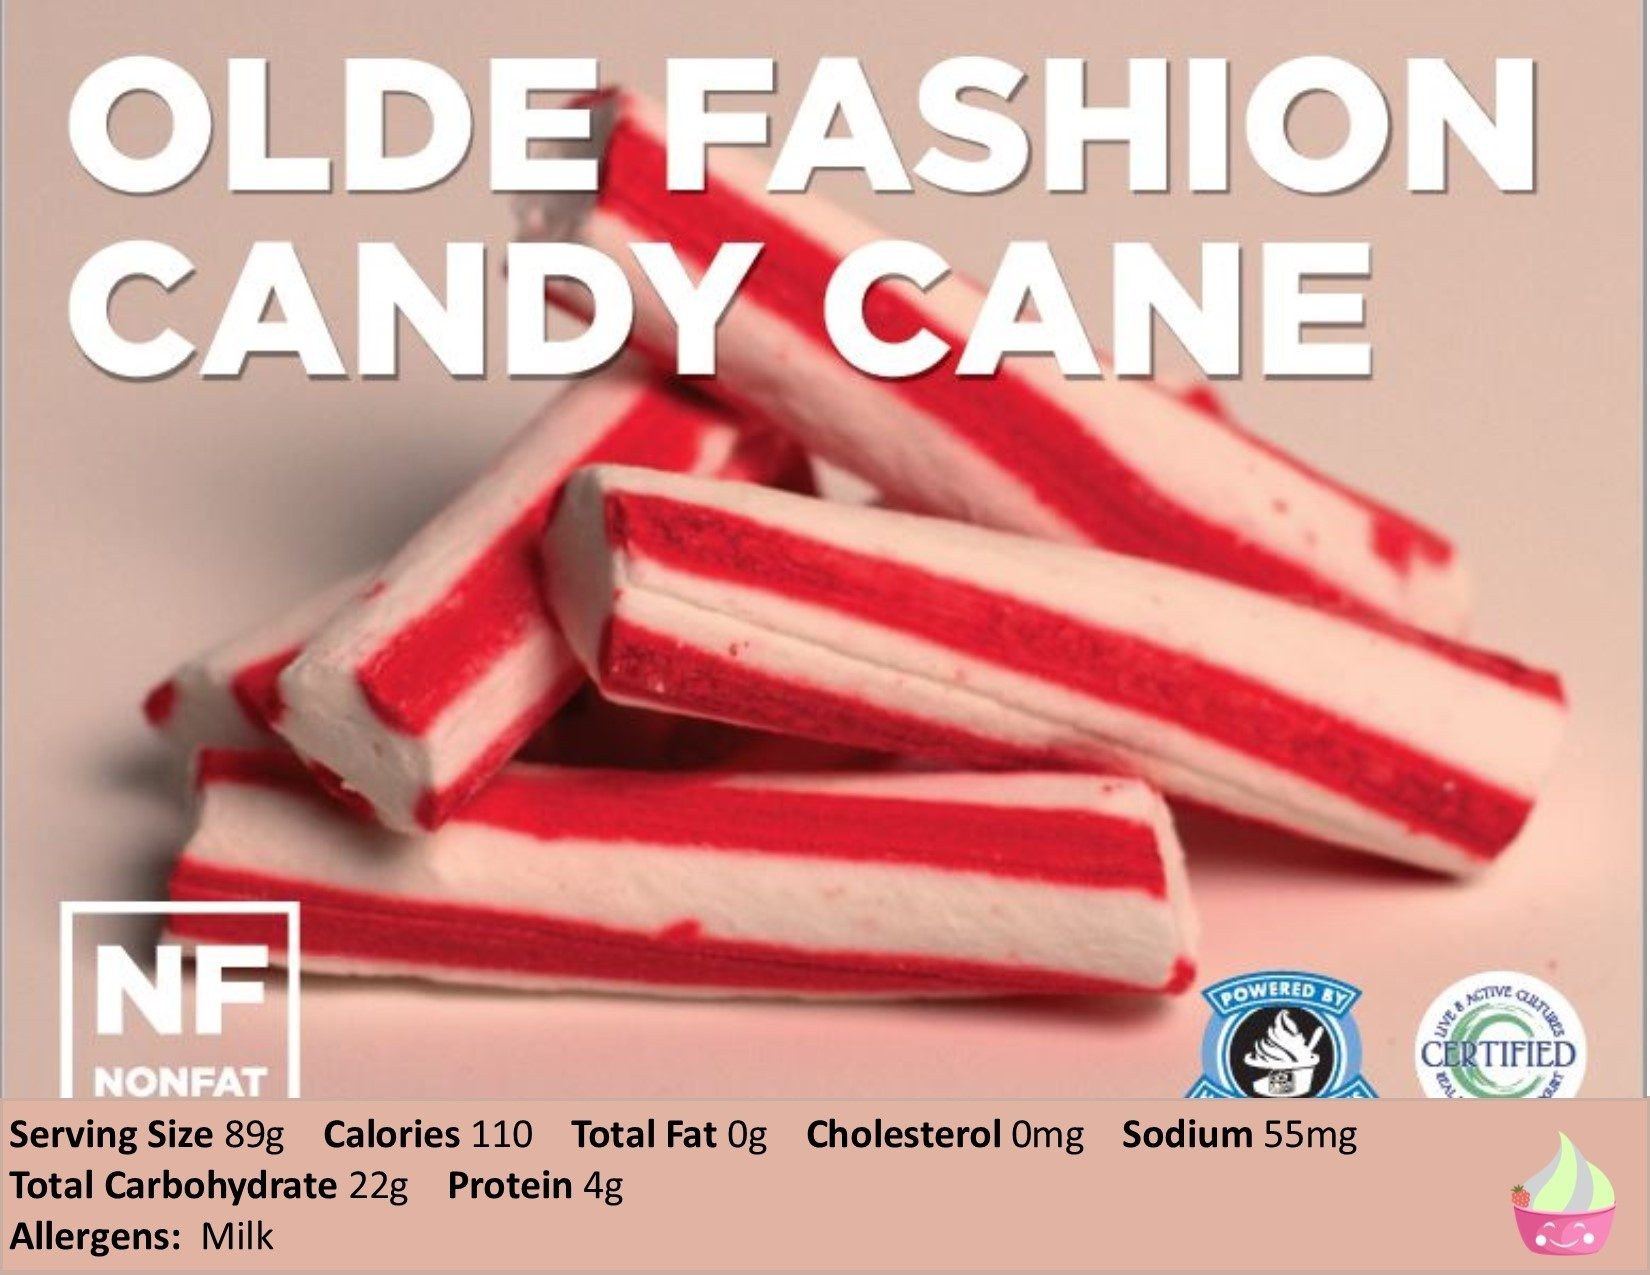 https://0201.nccdn.net/1_2/000/000/143/bc0/Olde-Fashion-Candy-Cane-NF-1650x1275-1650x1275.jpg